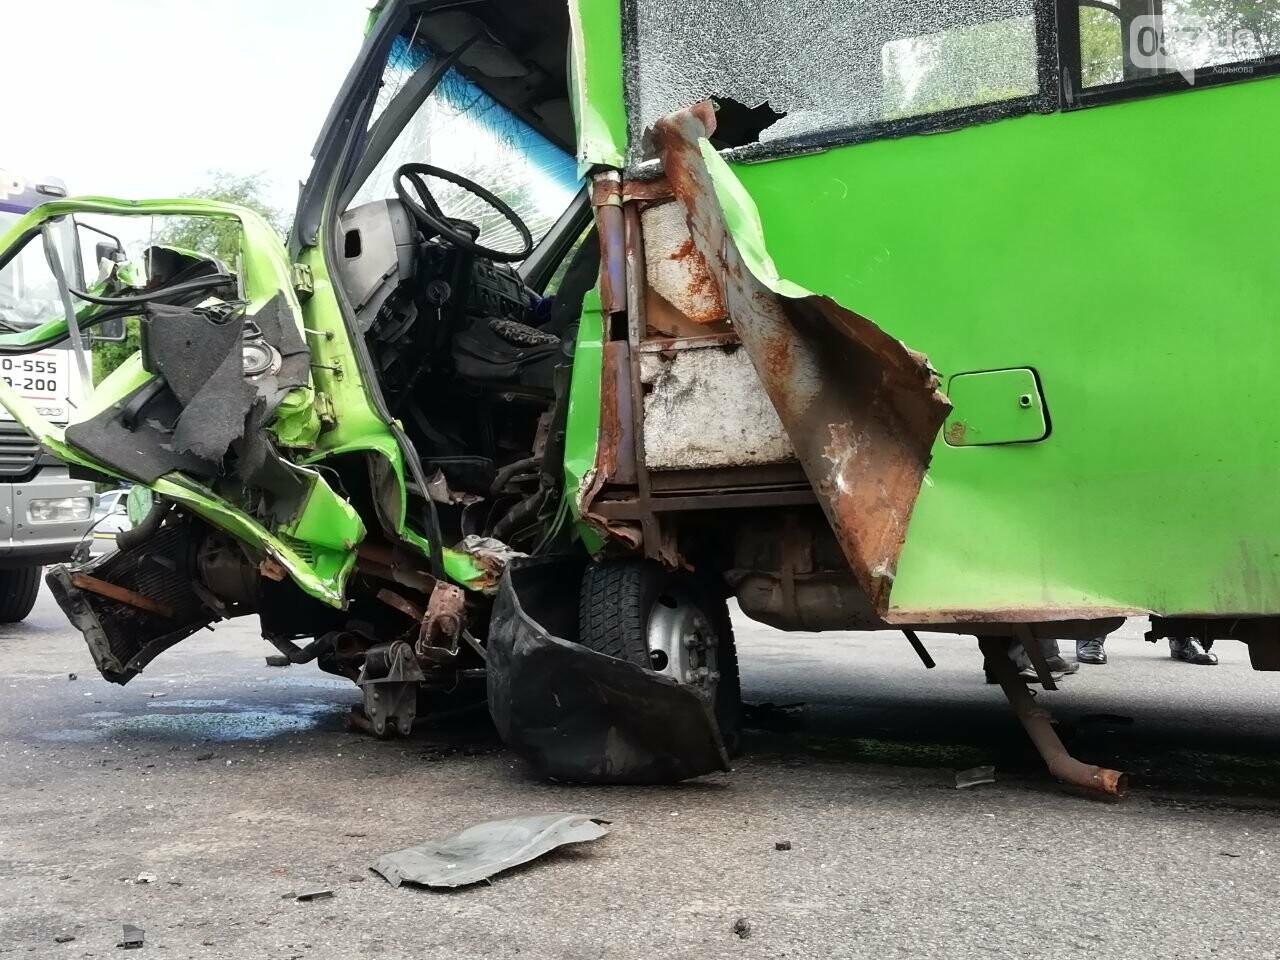 «Все сидели в крови»: подробности аварии на проспекте Тракторостроителей, - ФОТО, ВИДЕО, фото-5